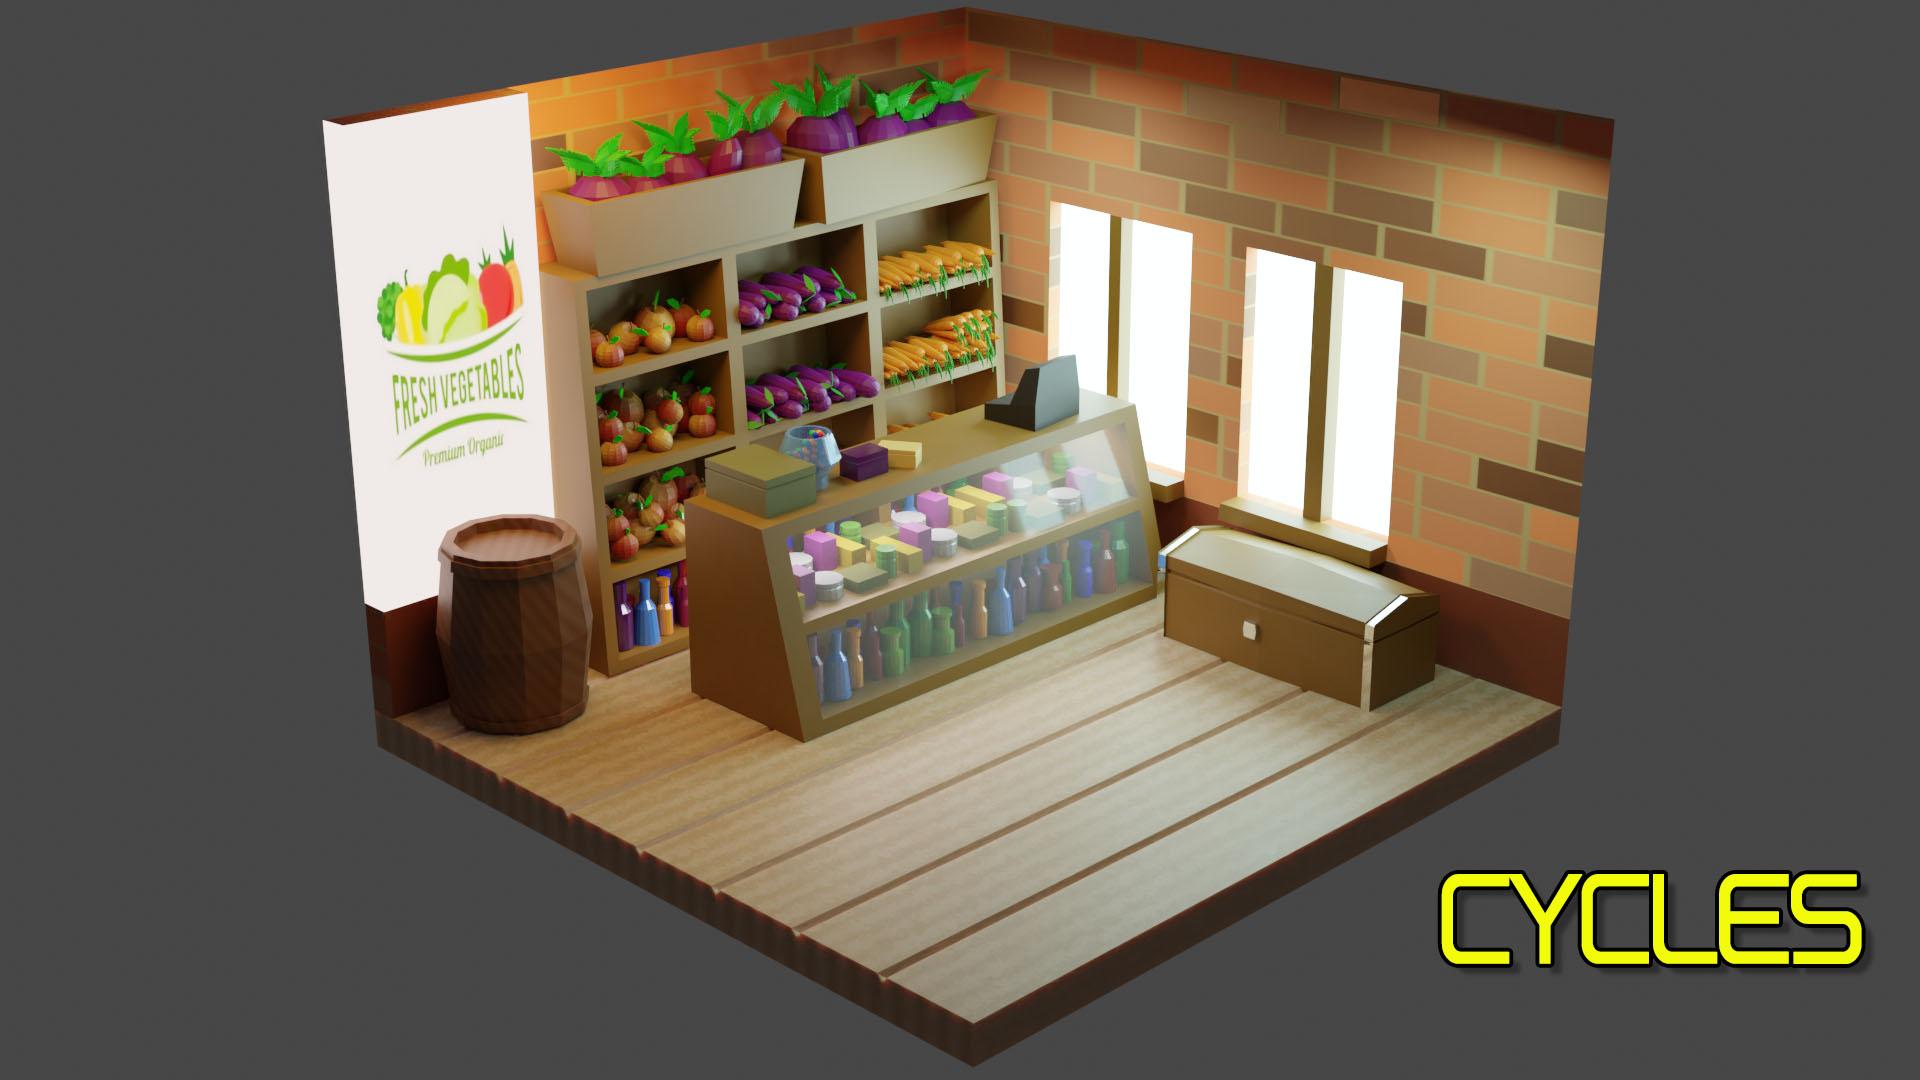 Vegets Shop. (Low-poly) in Blender cycles render image